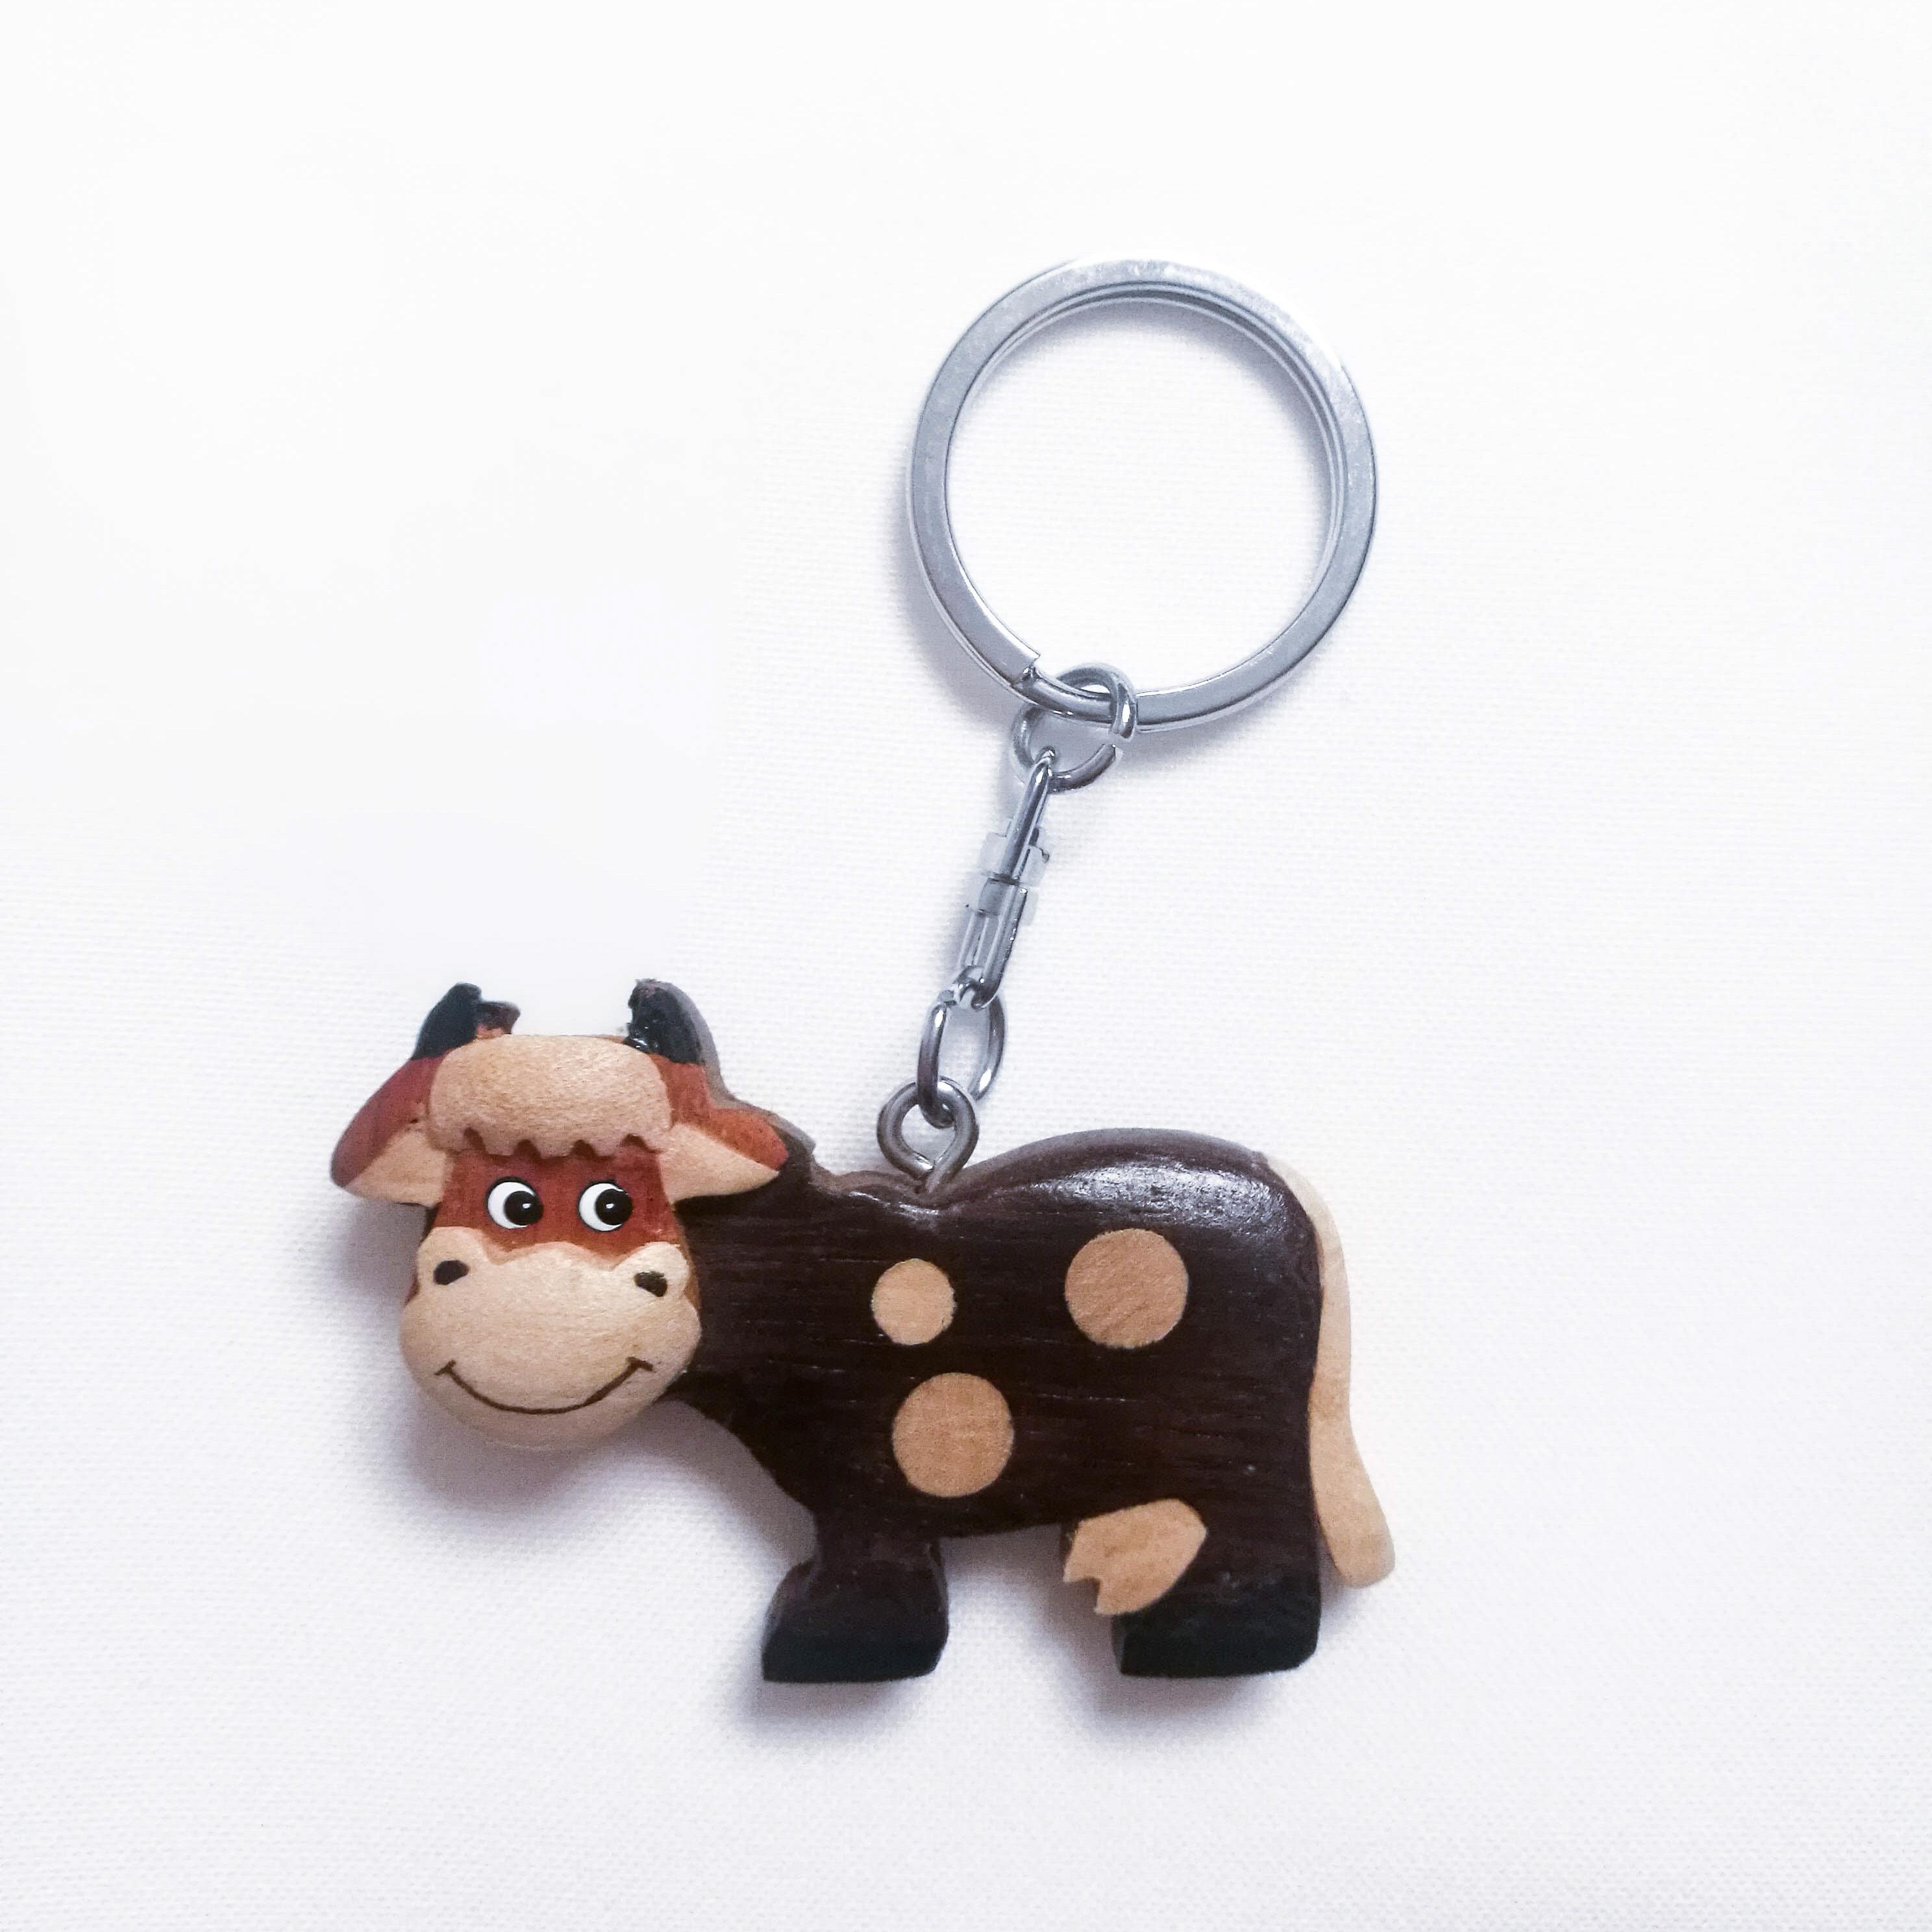 Schlüsselkette aus Holz Kuh